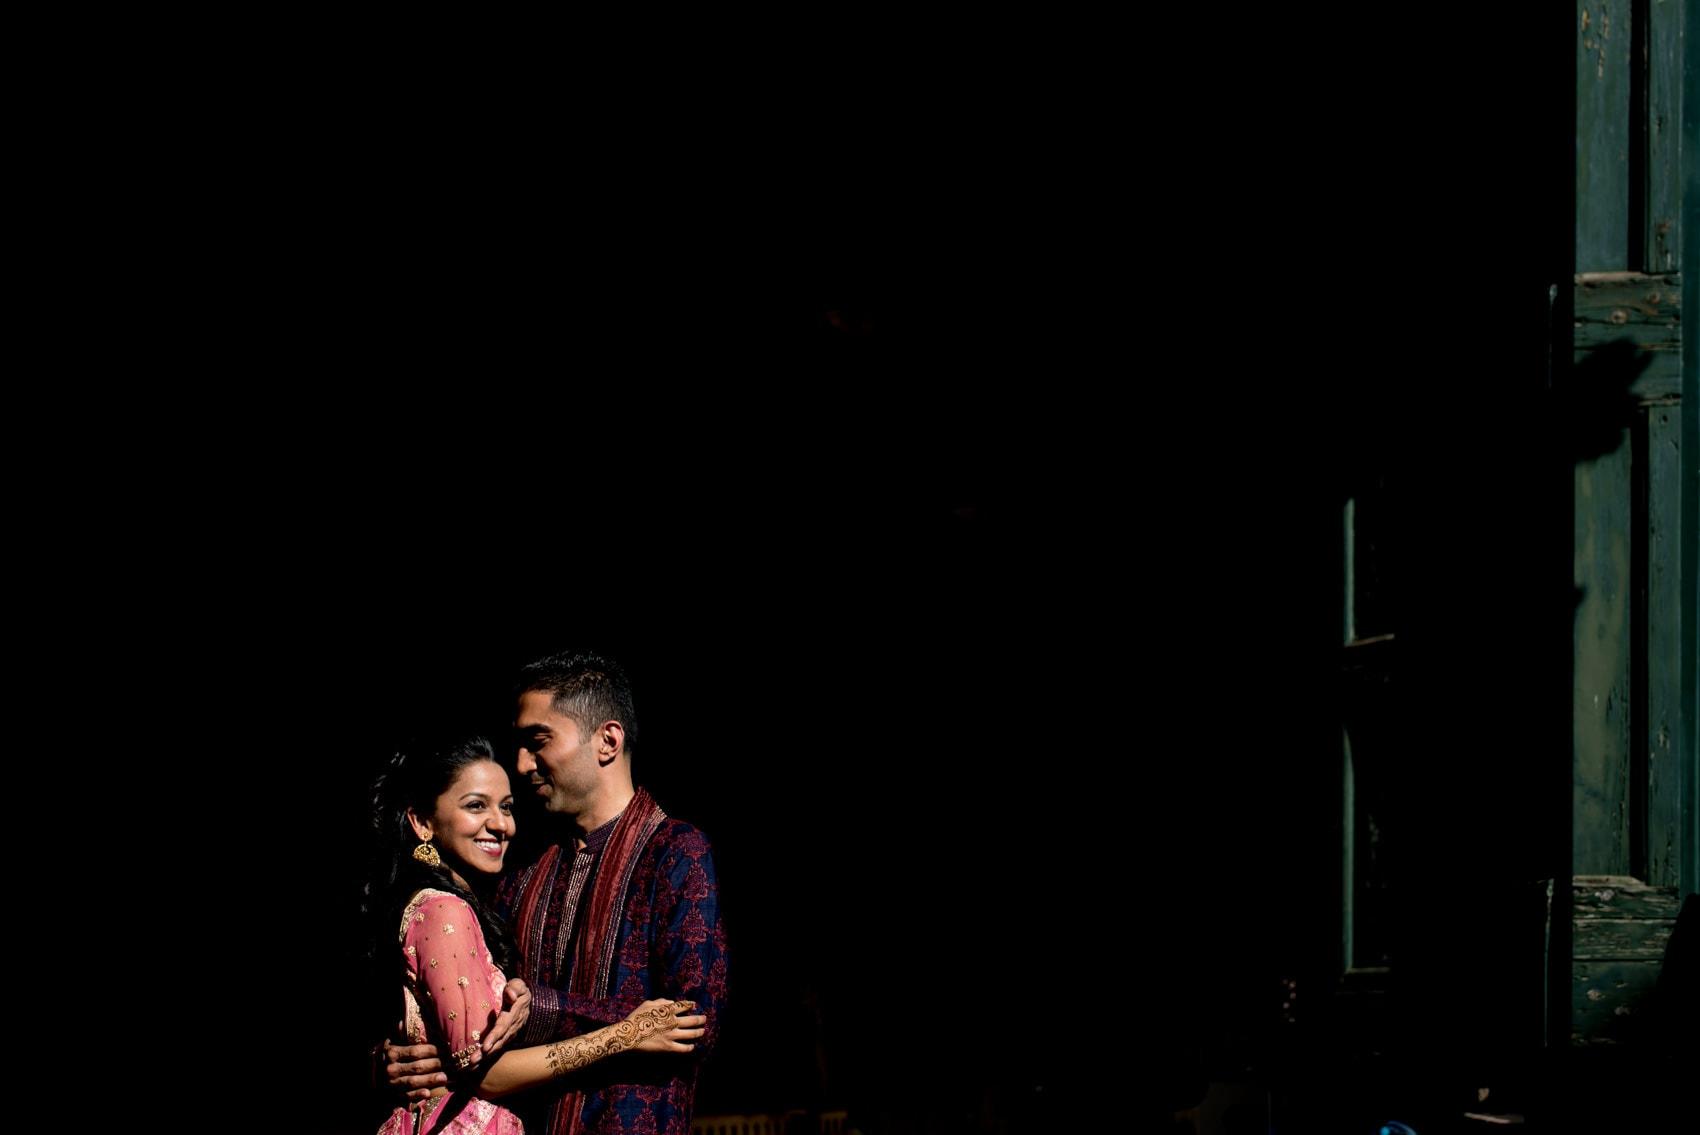 Couple in beautiful light at Giardino Corsini al Prato in Florence